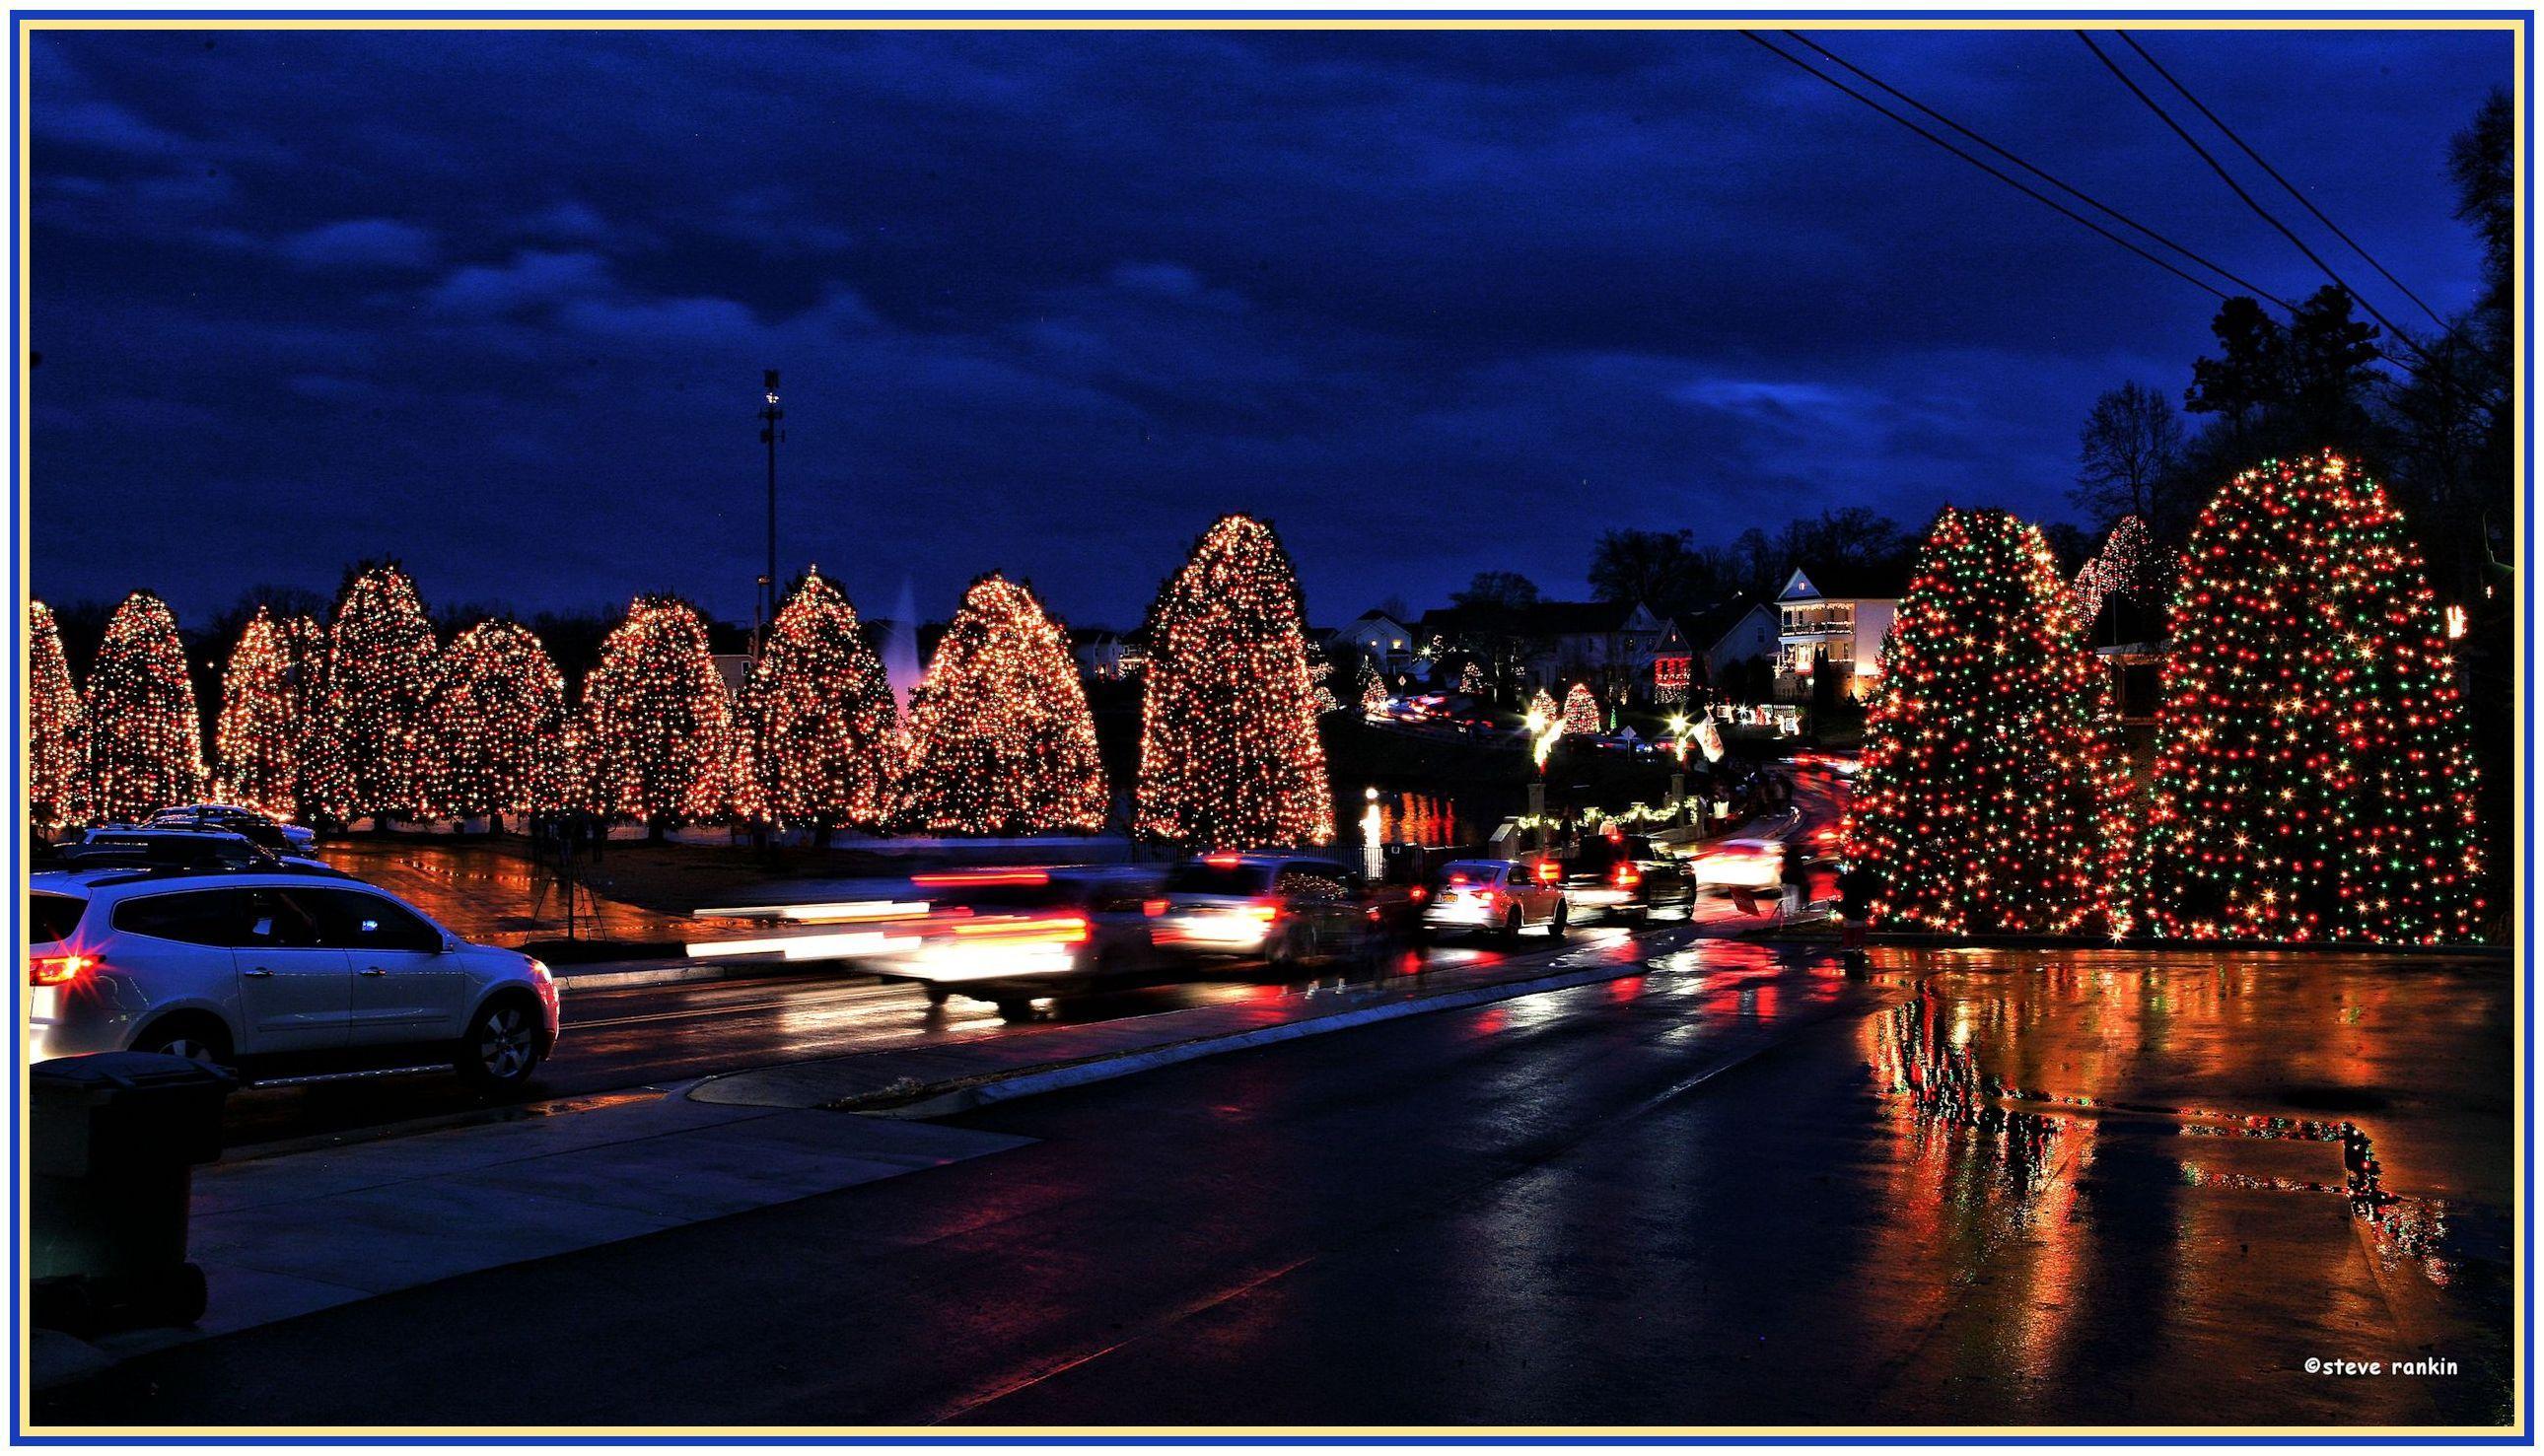 Belmont Nc Christmas Parade 2020 Belmont Nc Christmas Parade 2020 Lakeland | Hvbhsy